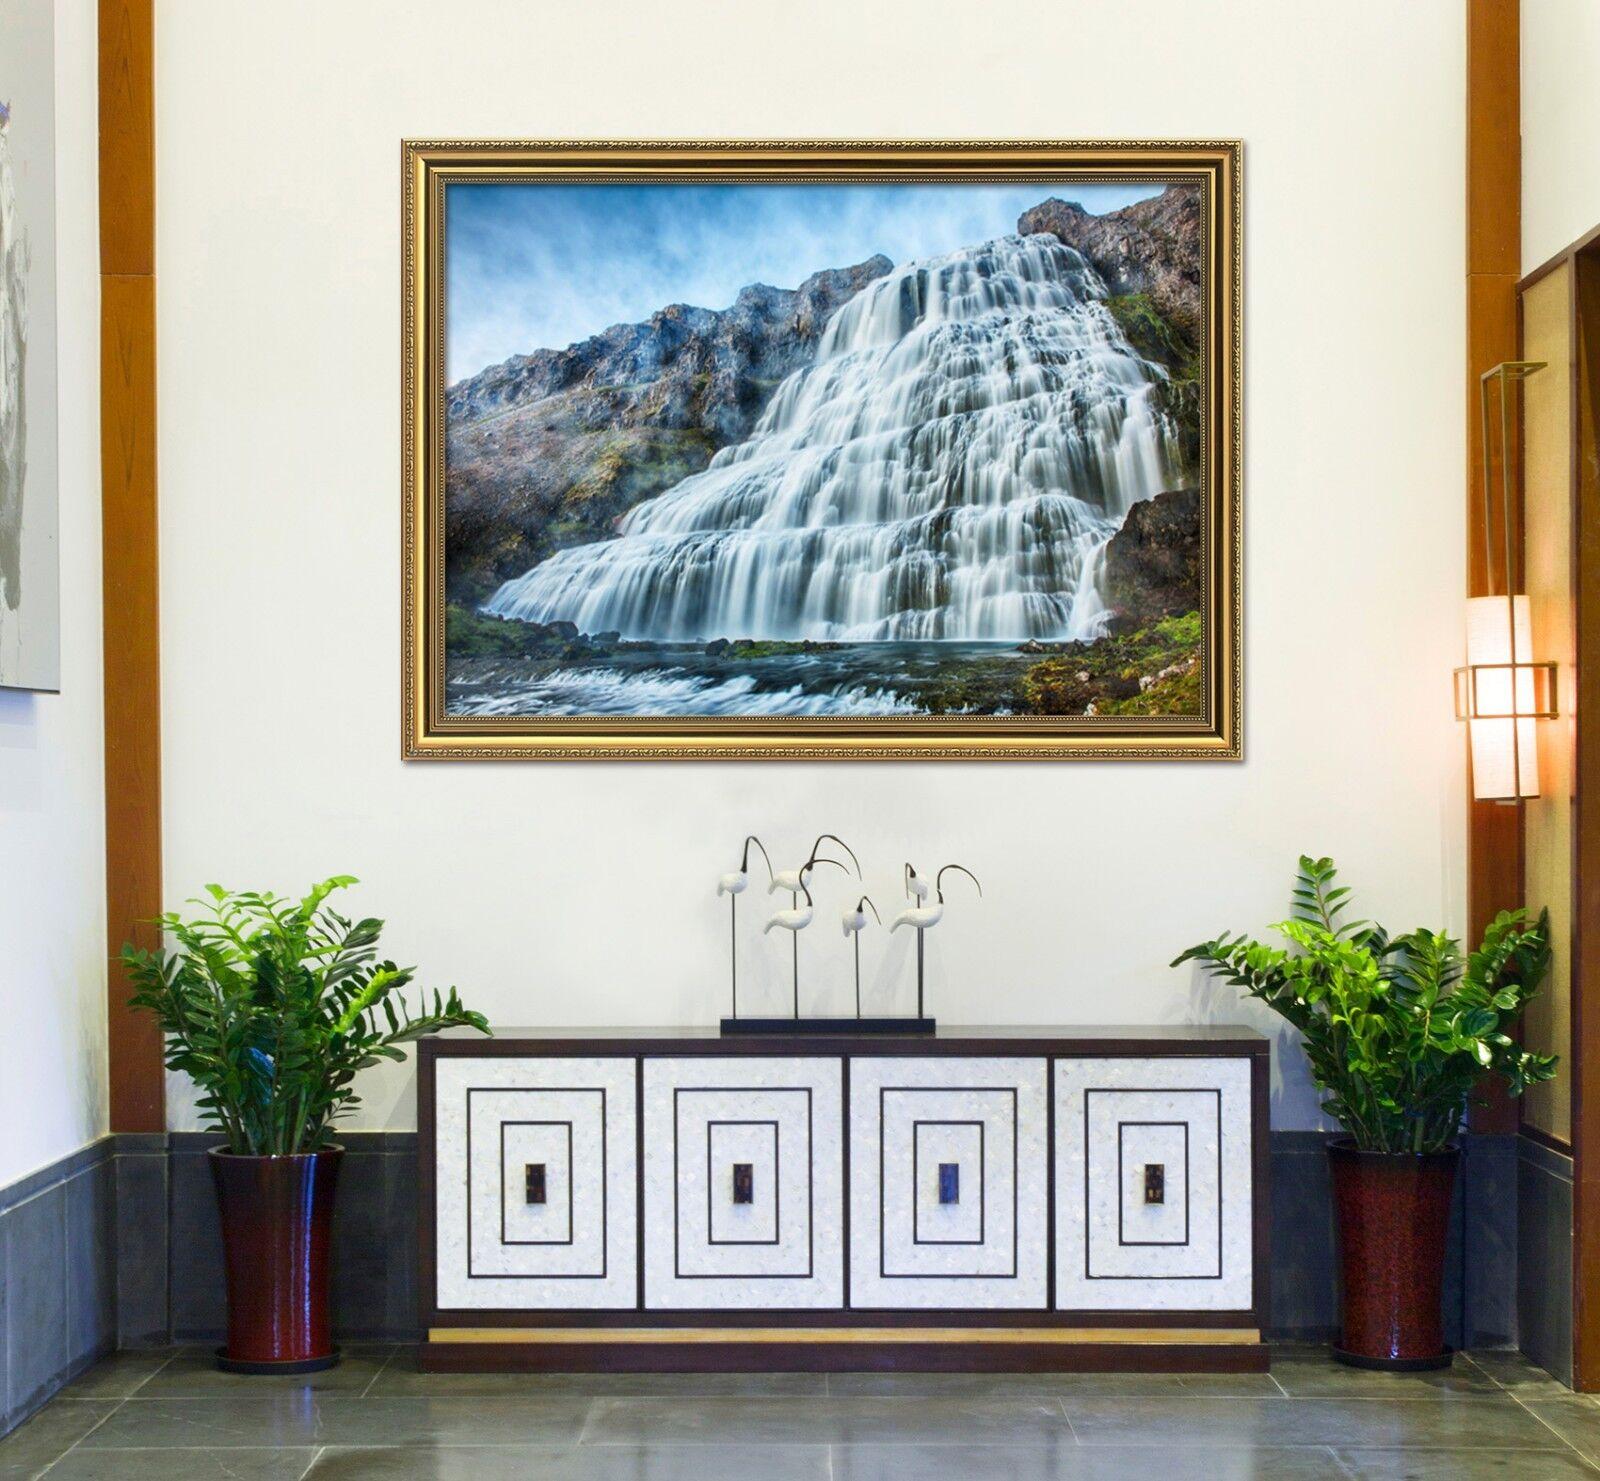 3D Waterfall Mountain 1 Framed Poster Home Decor Print Painting Art AJ WALLPAPER